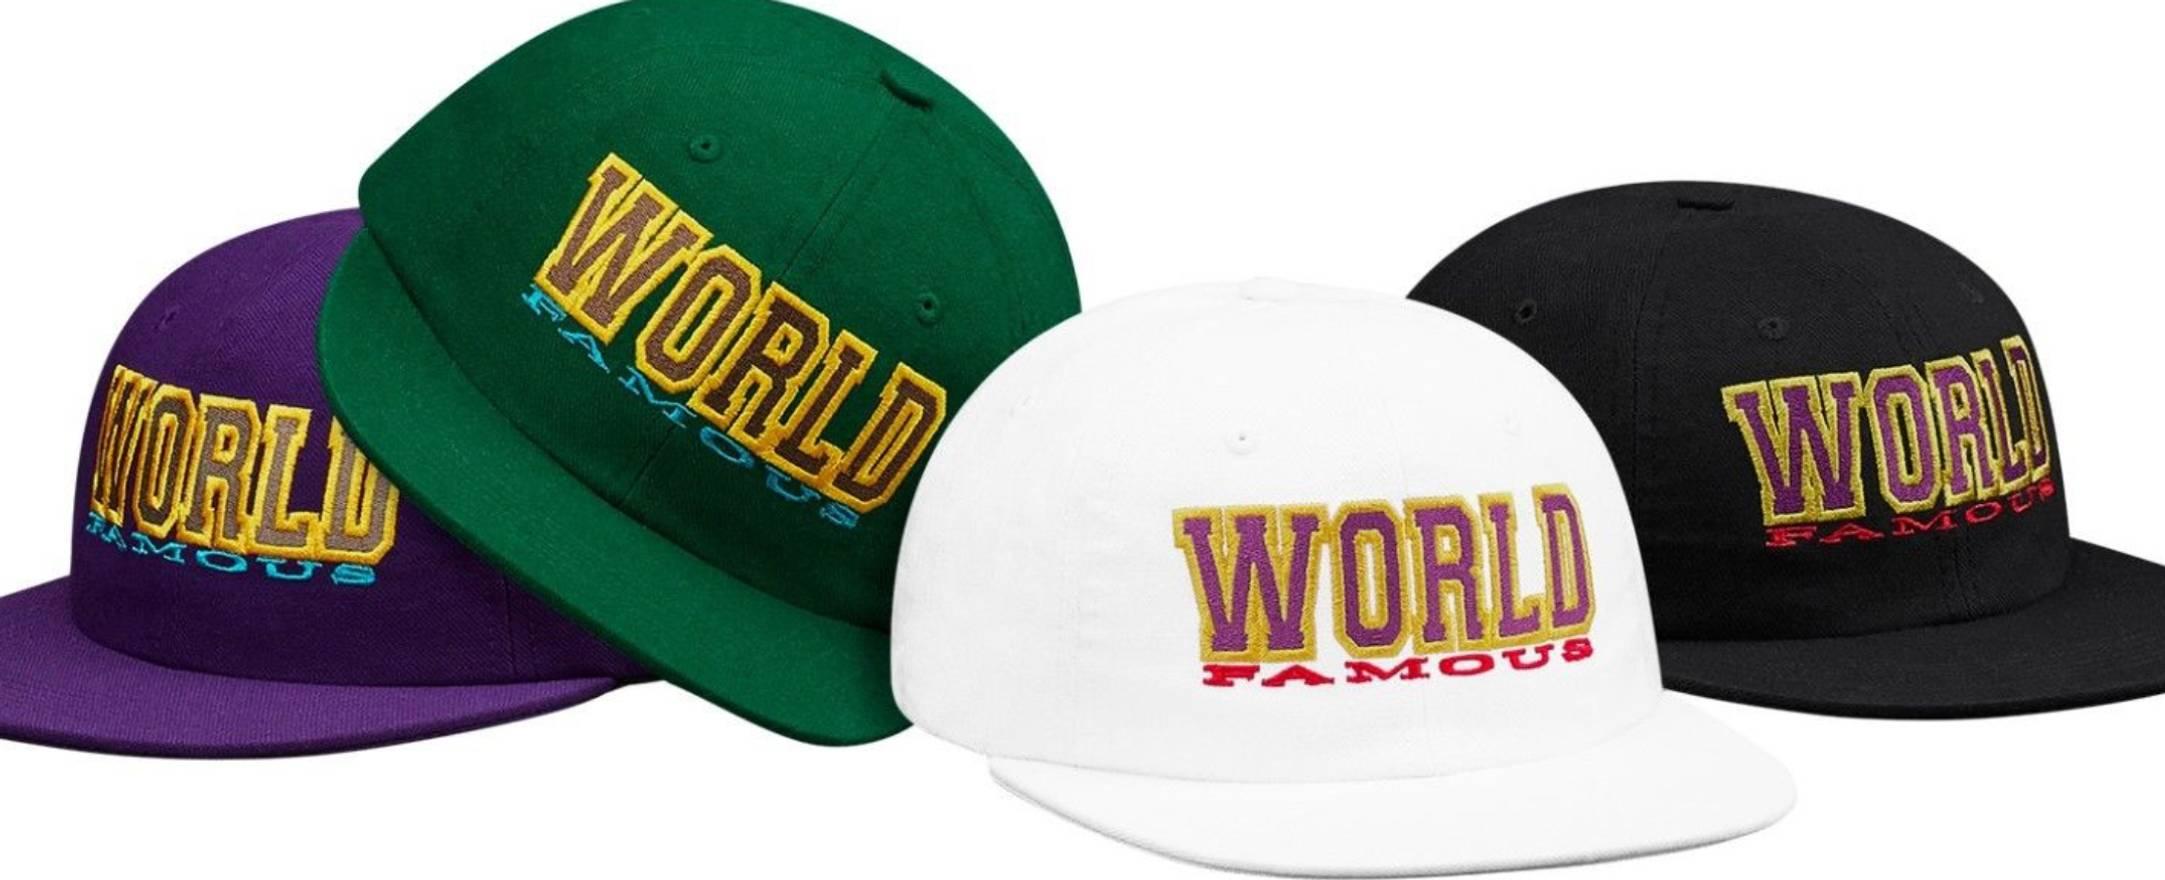 ea6b65a72ff ... sweden supreme new supreme world famous 6 panel white snapback hat size  one size a4f91 93c9f